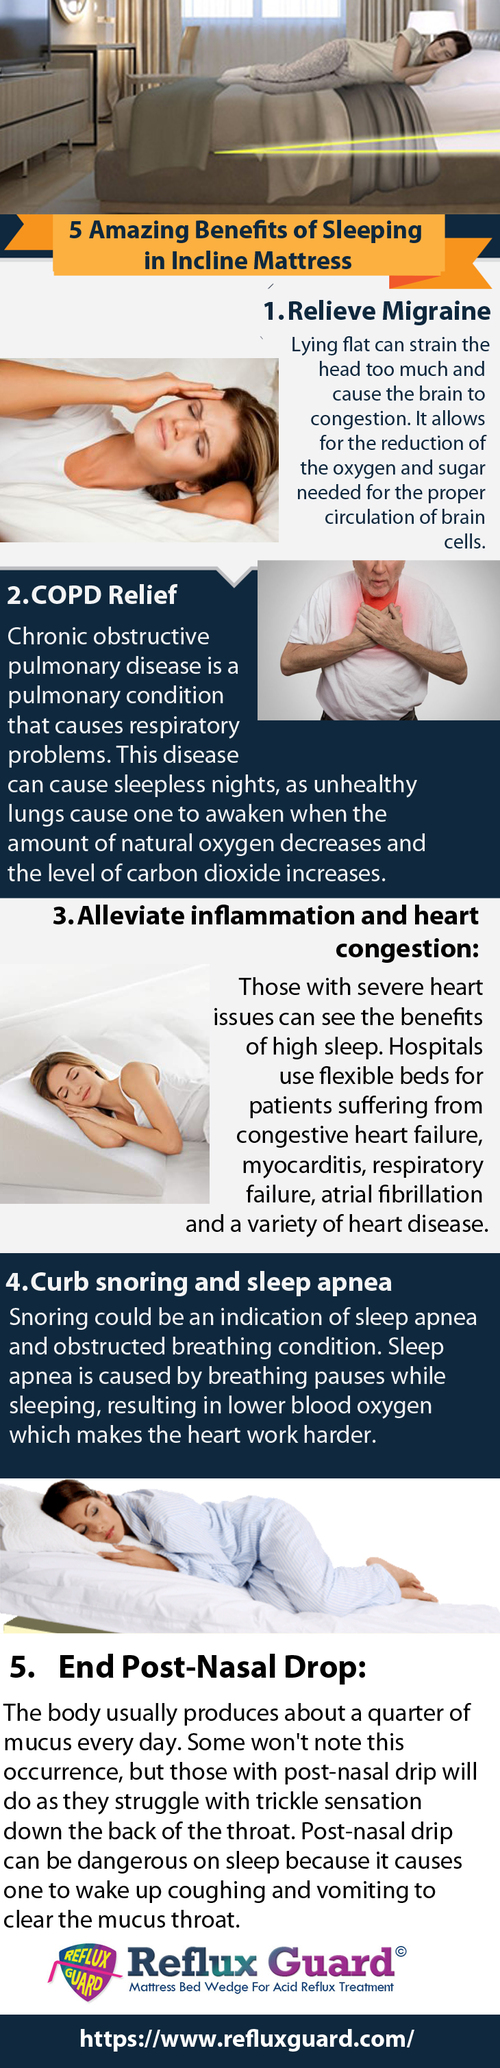 5 Amazing Benefits of Sleeping in Incline Mattress via Reflux Guard